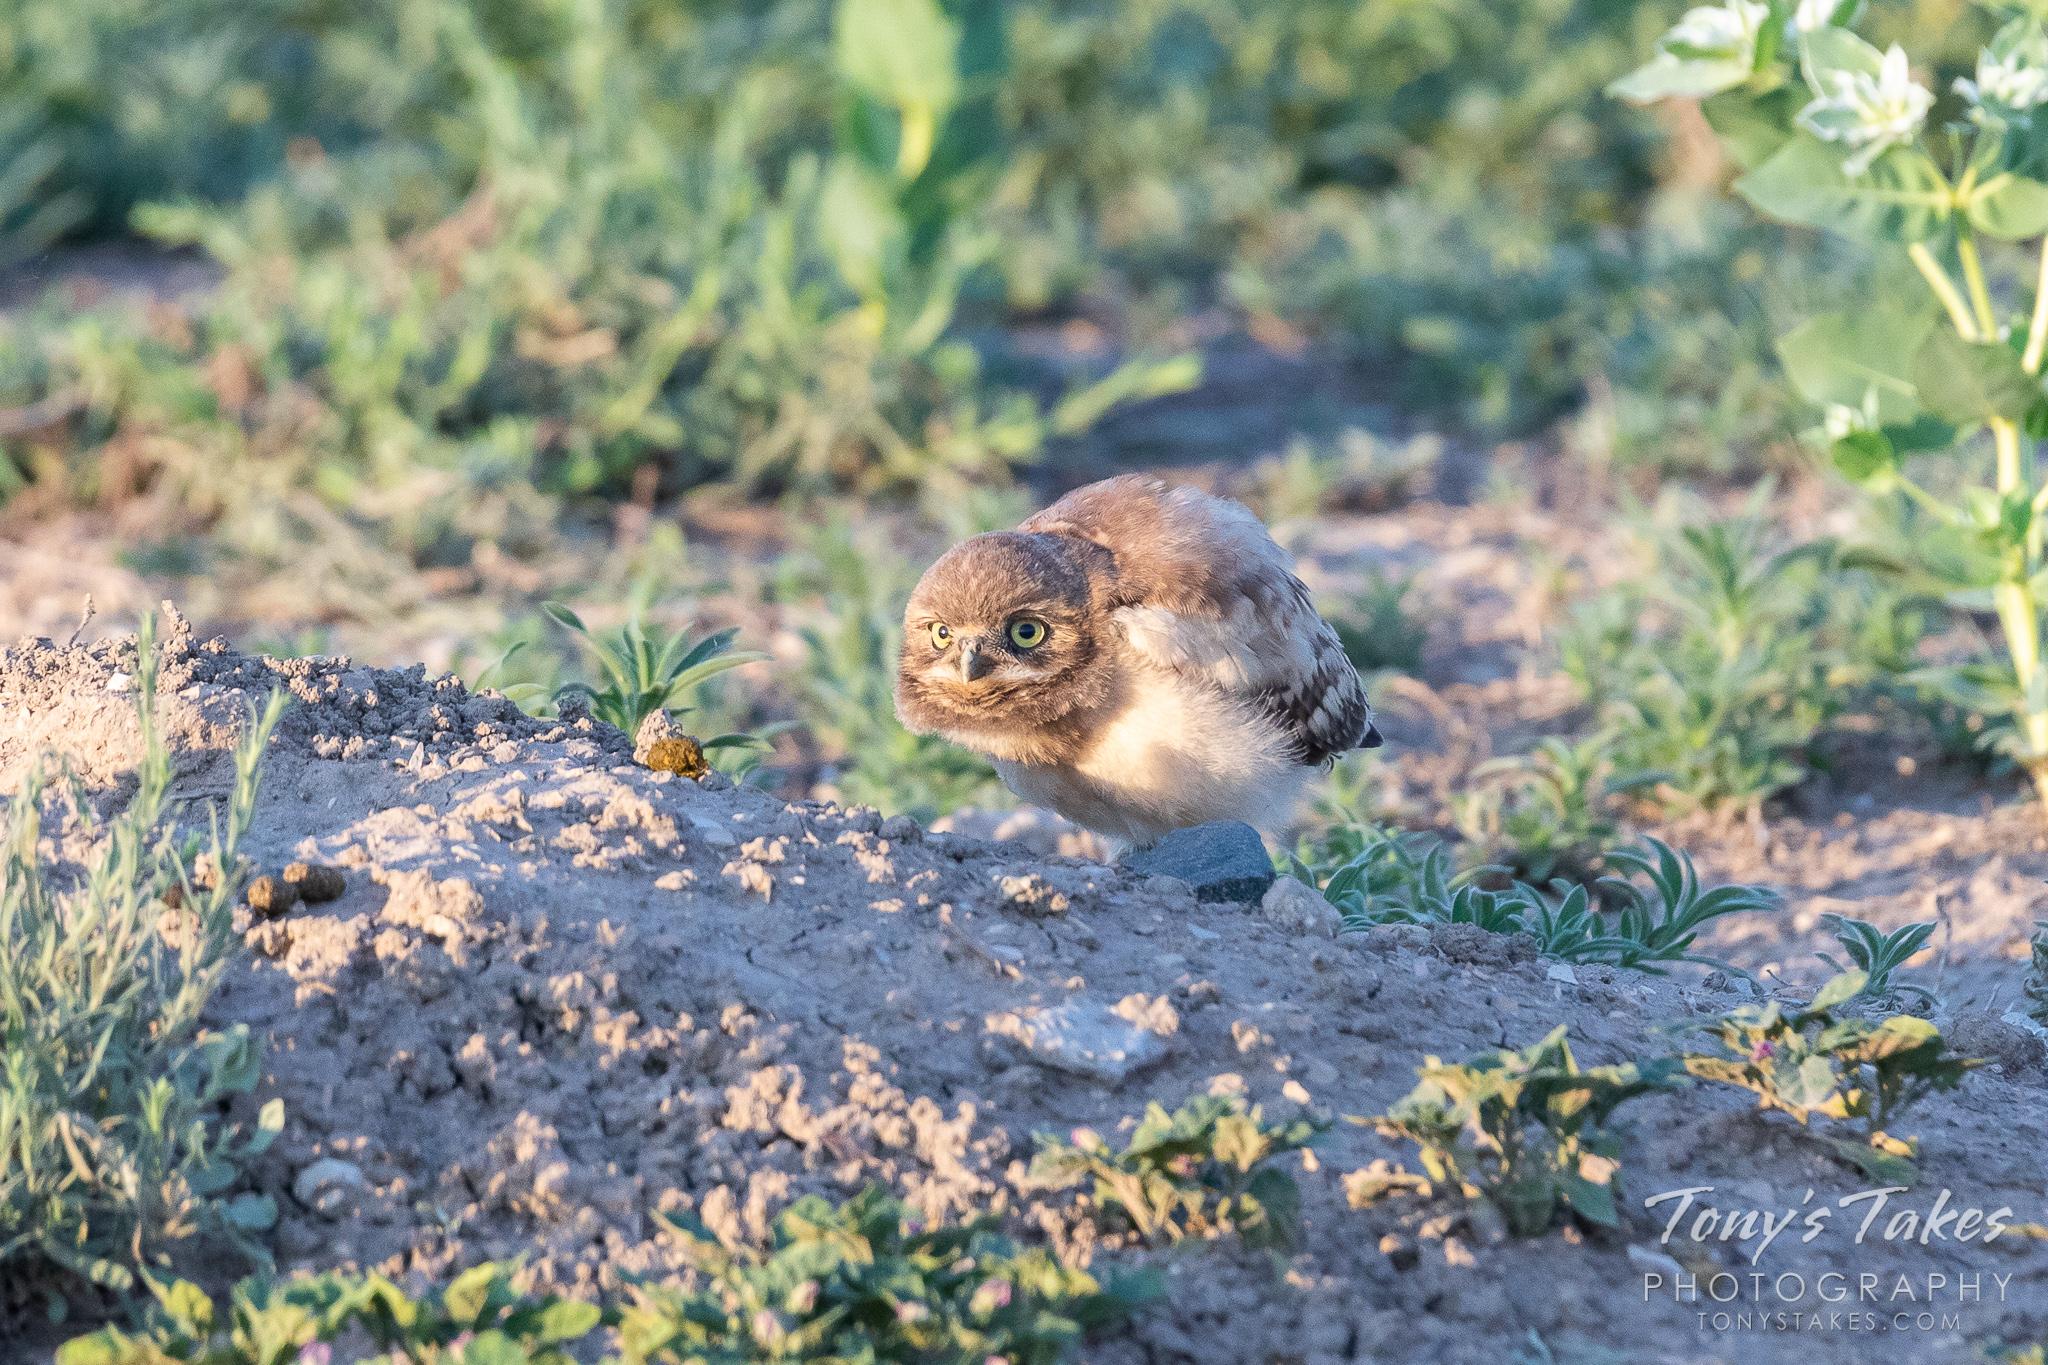 Burrowing owl owlet hunkers down, keeps close watch